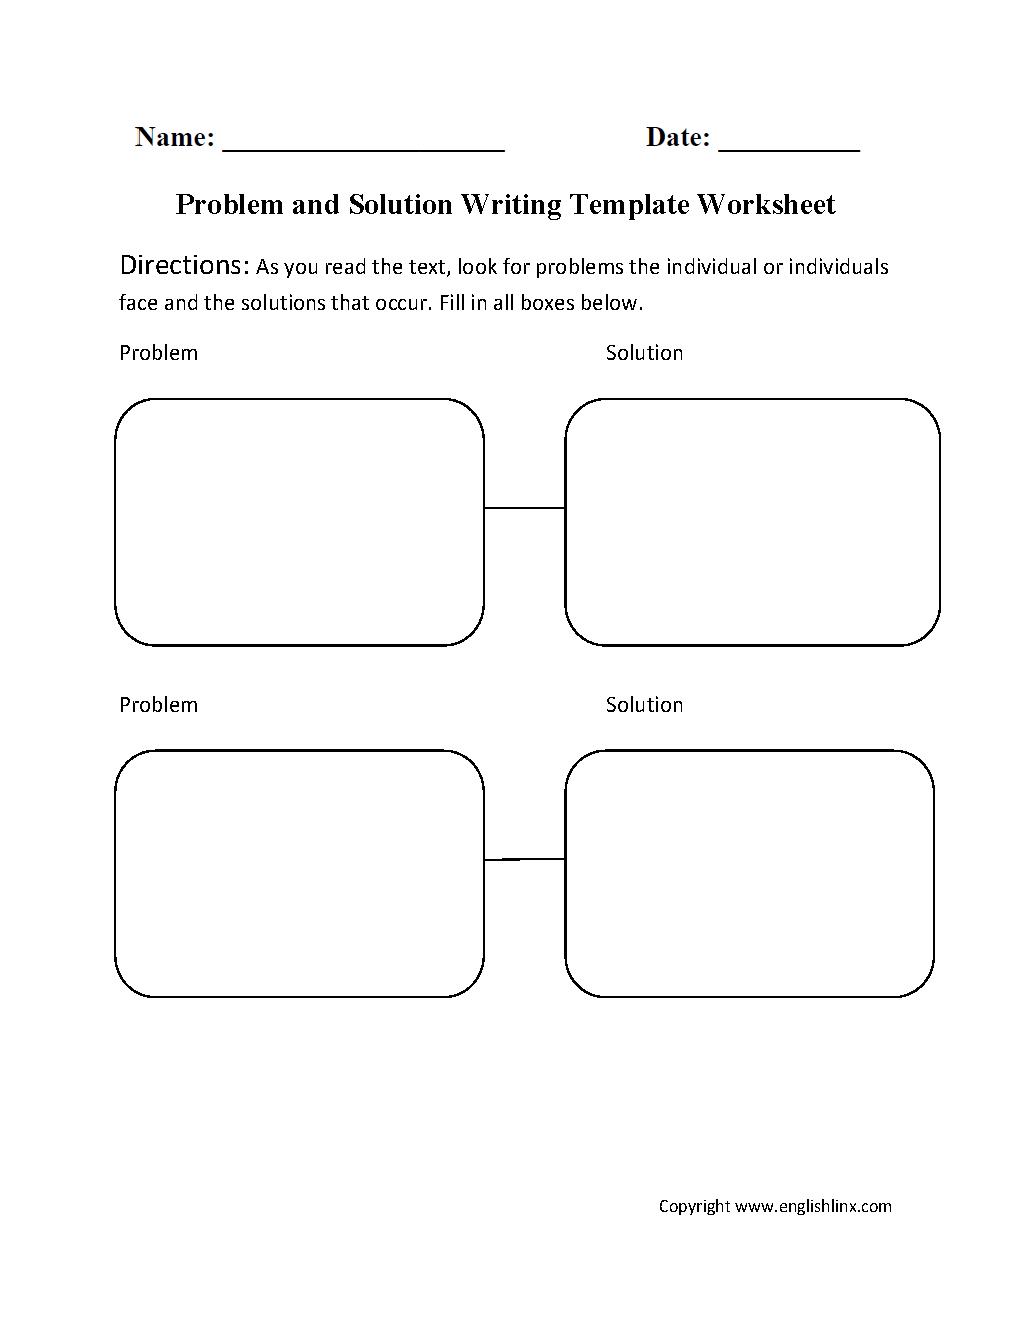 Workbooks las posadas worksheets : Problem Solution Worksheets Free Worksheets Library | Download and ...